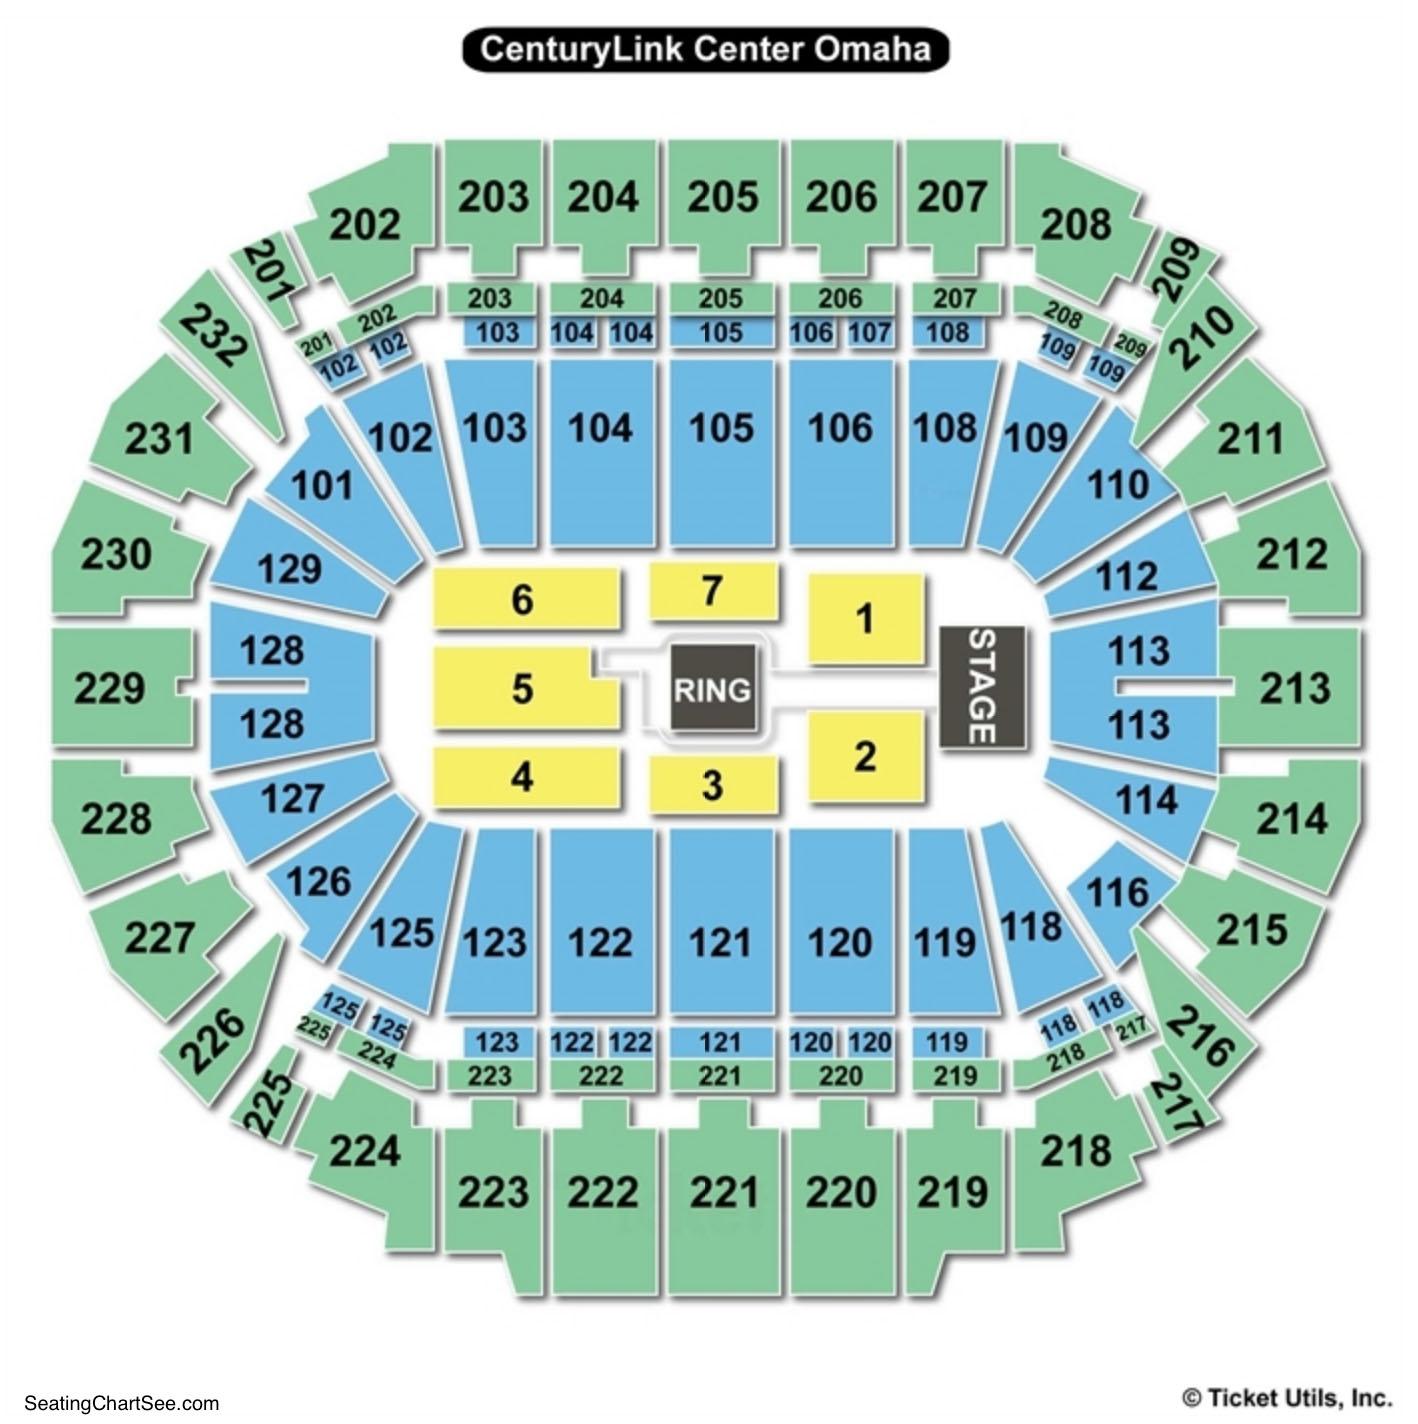 CenturyLink Center Omaha Seating Chart WWE